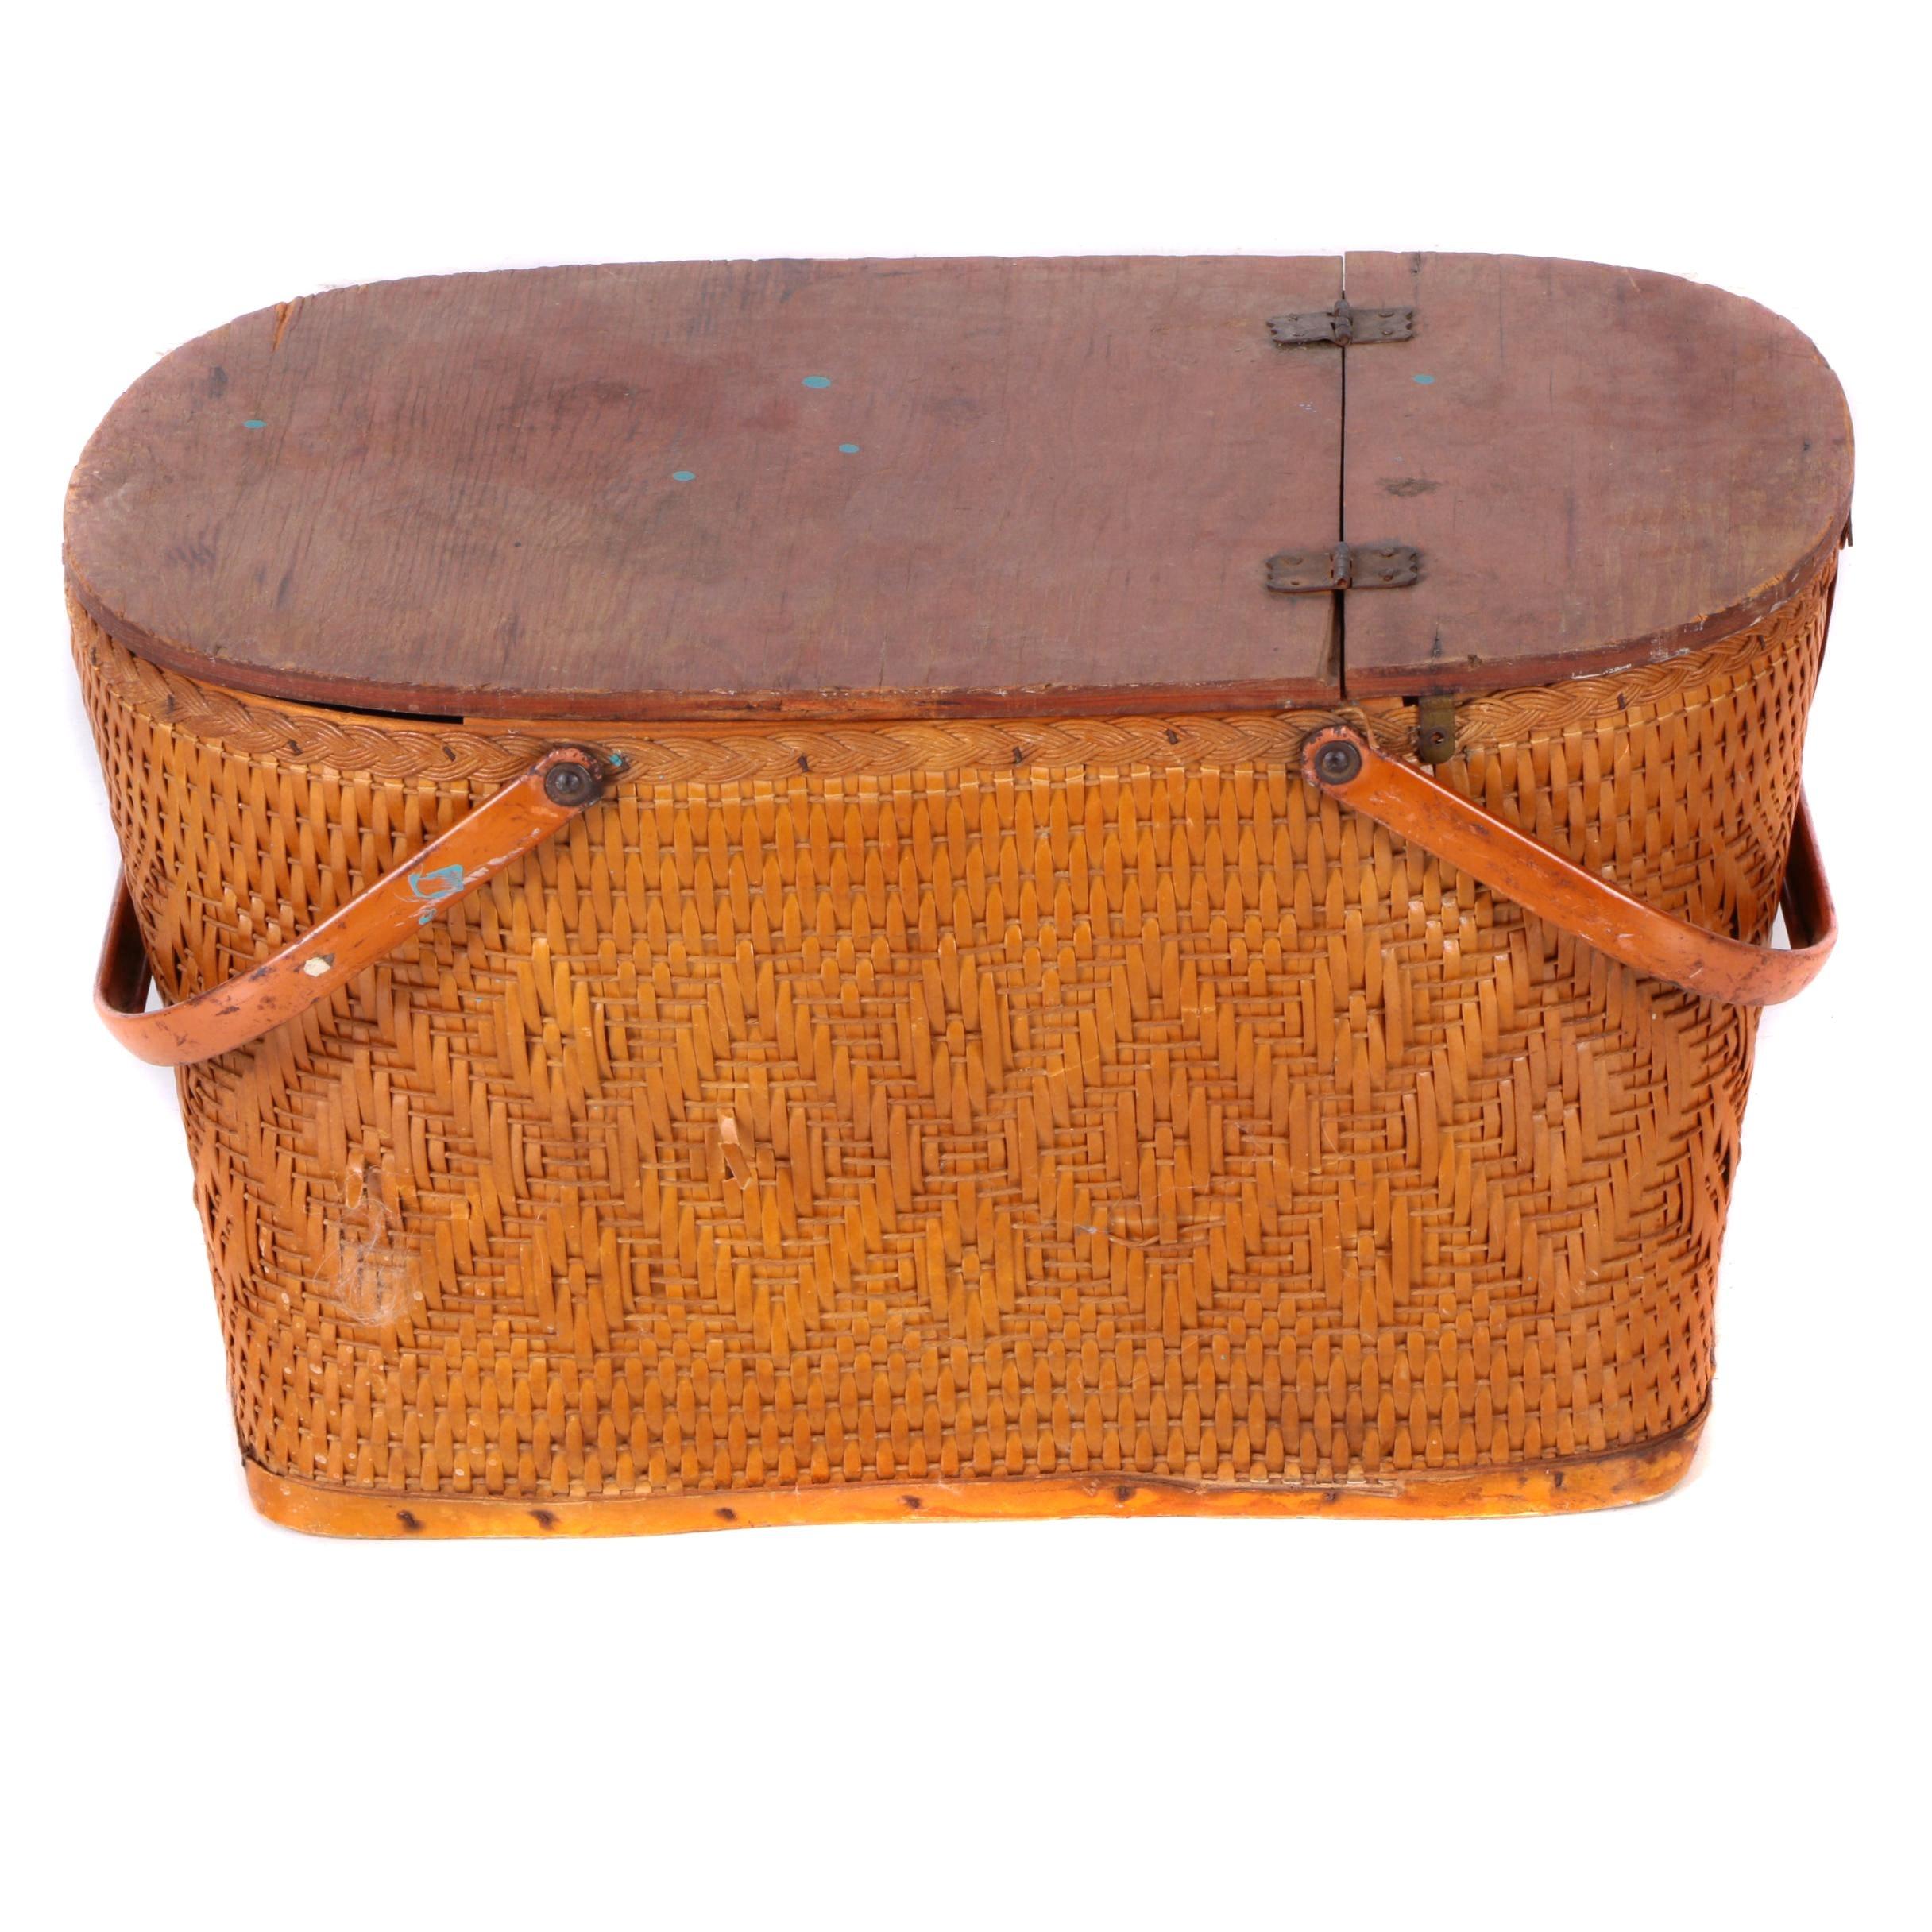 Vintage Woven Reed Picnic Basket